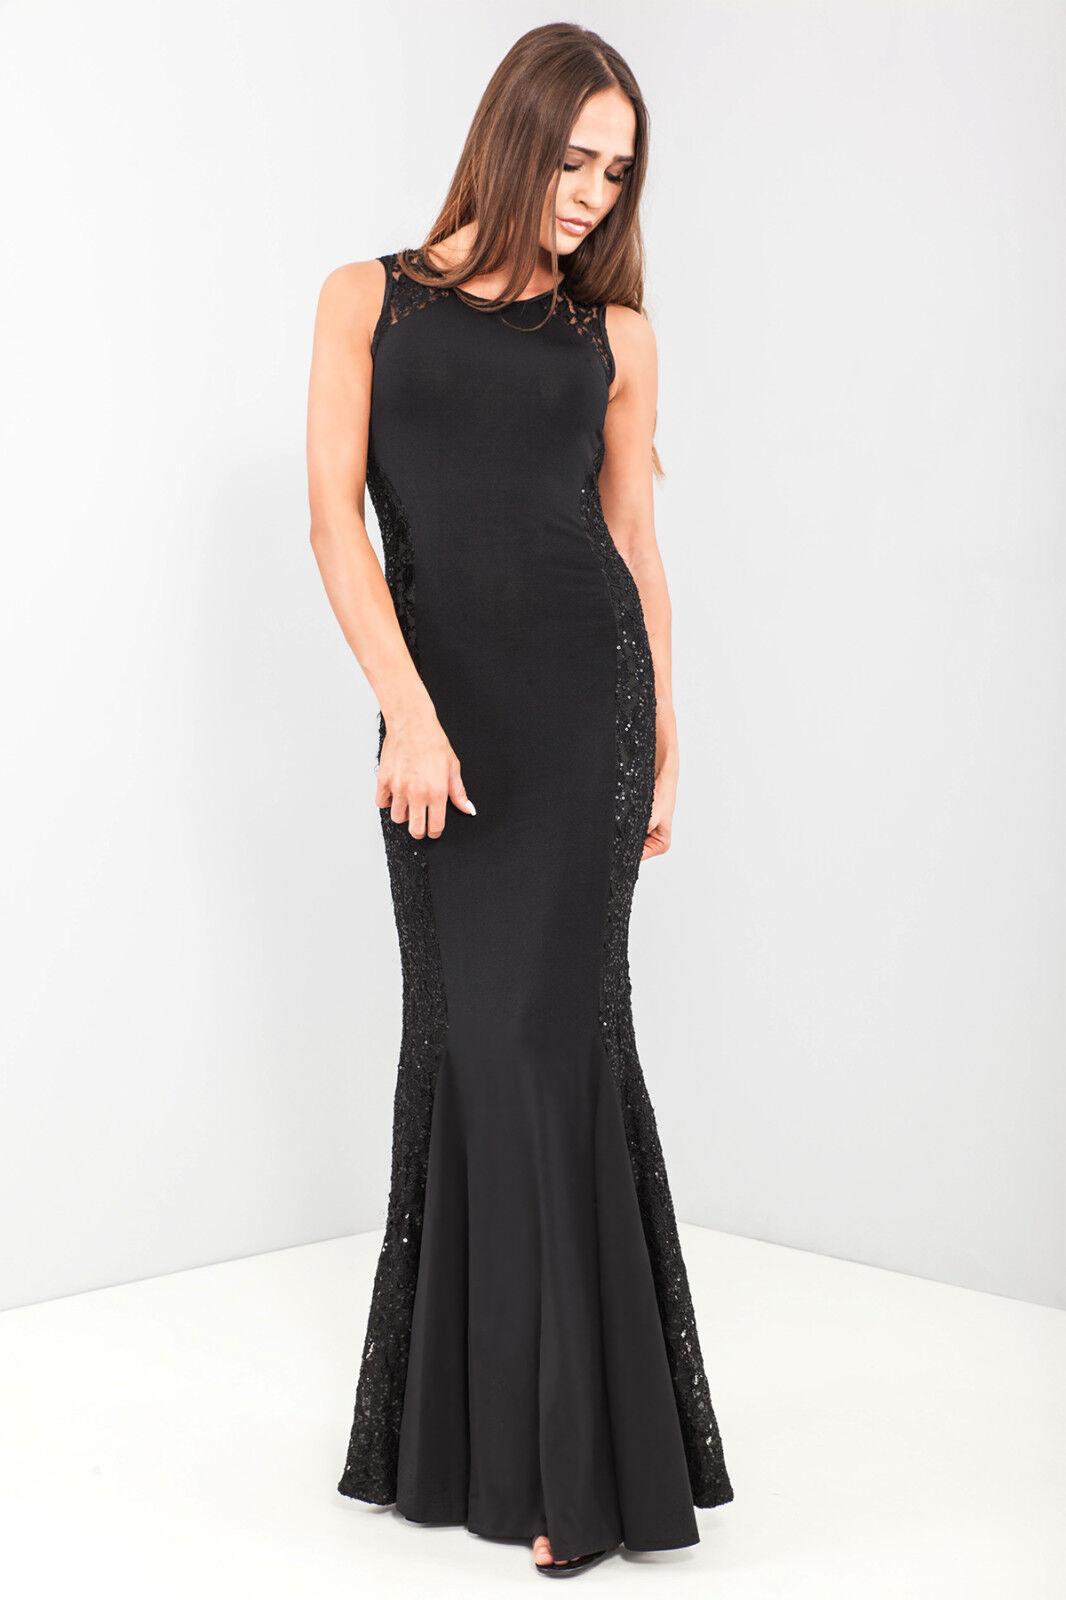 c18aa2589e QUIZ Sequin Lace Pleated Hem Maxi Dress. RRP £65.00 £17.99 + Free Postage